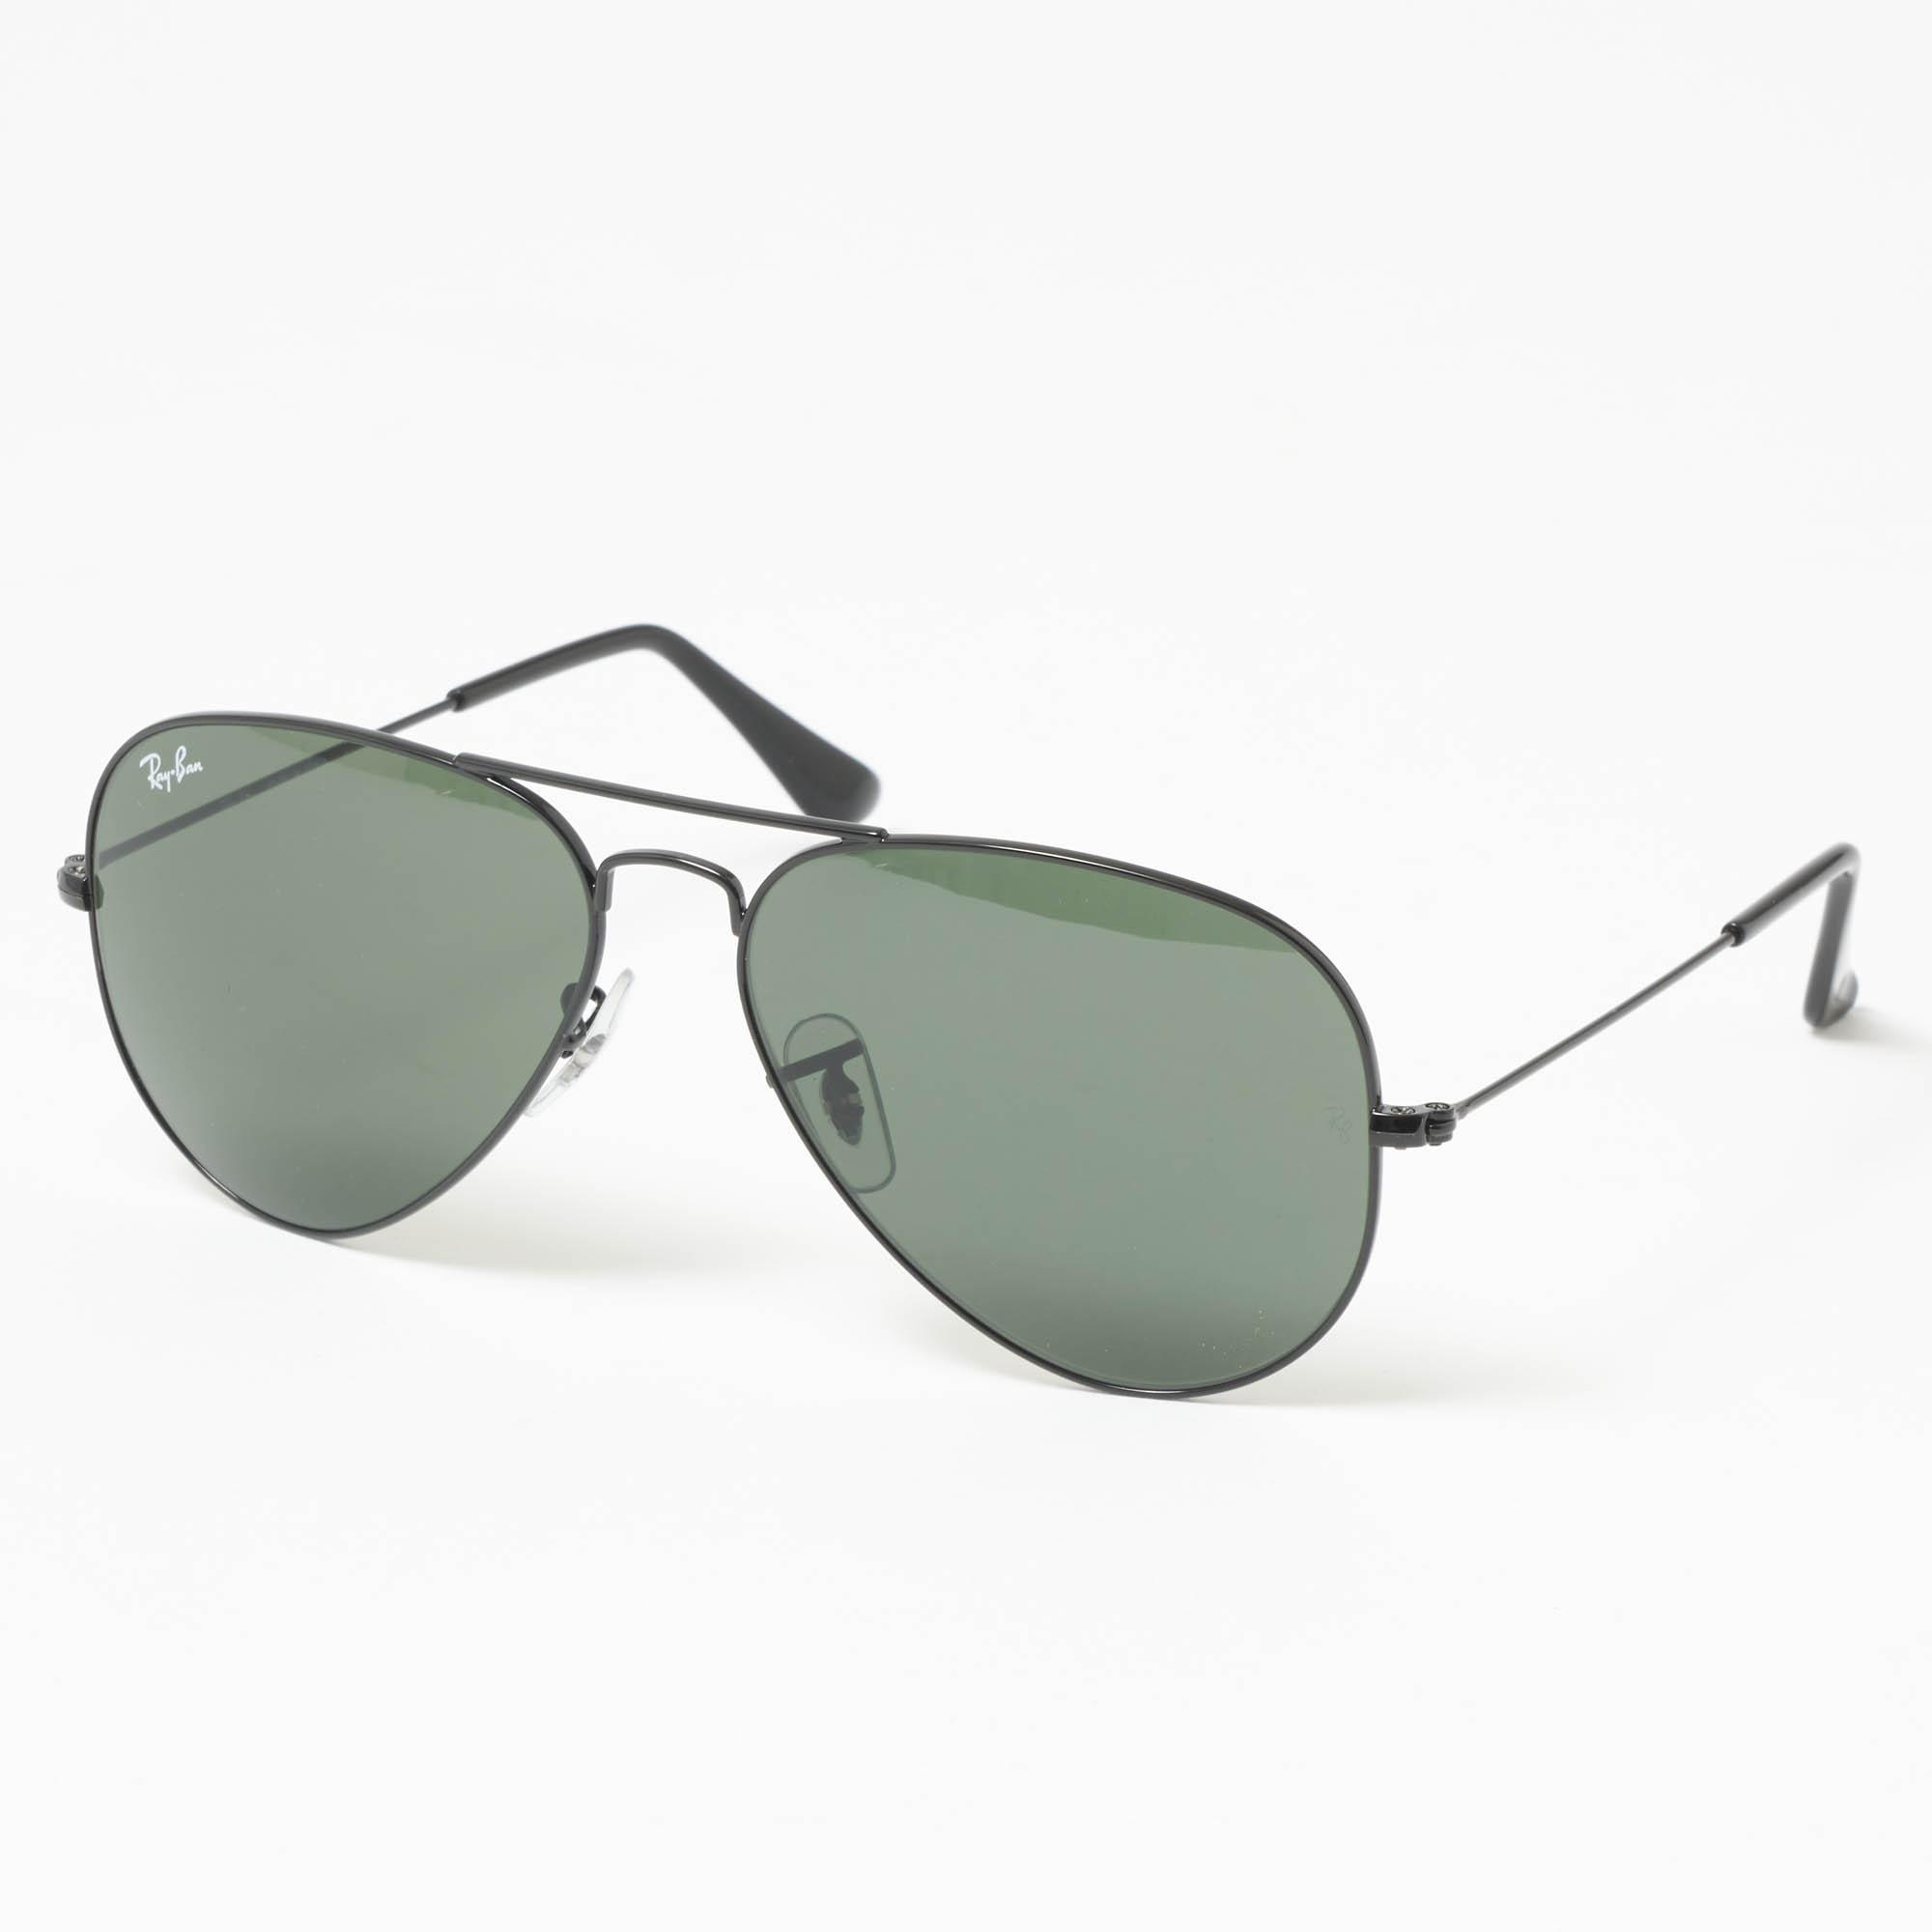 2253d62d30 Black Aviator Classic Sunglasses - Green Classic G-15 Lenses